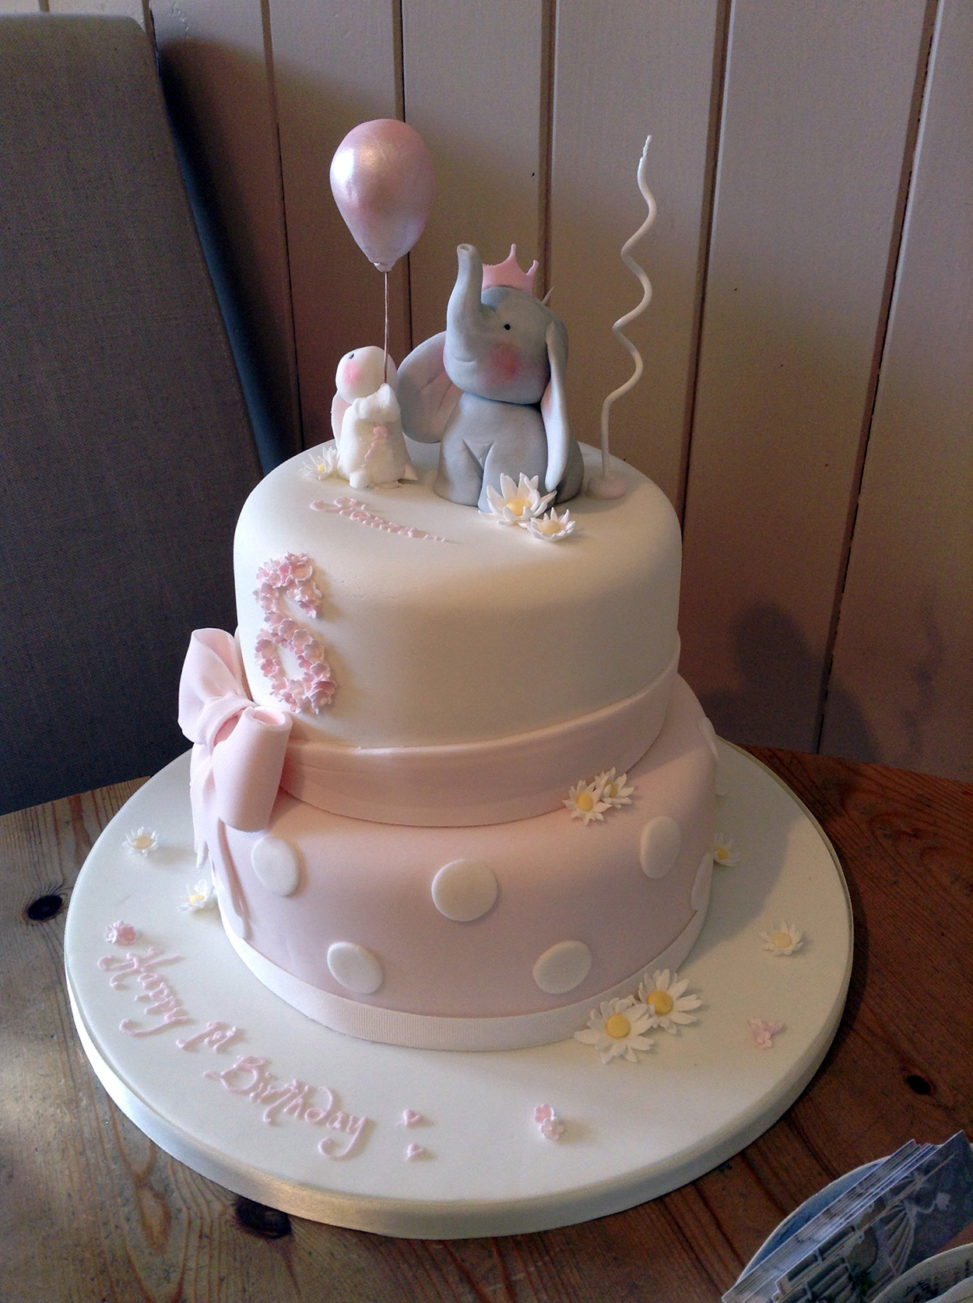 Elephant Birthday Cakes Ba Elephant Birthday Cake The Wedding Cake